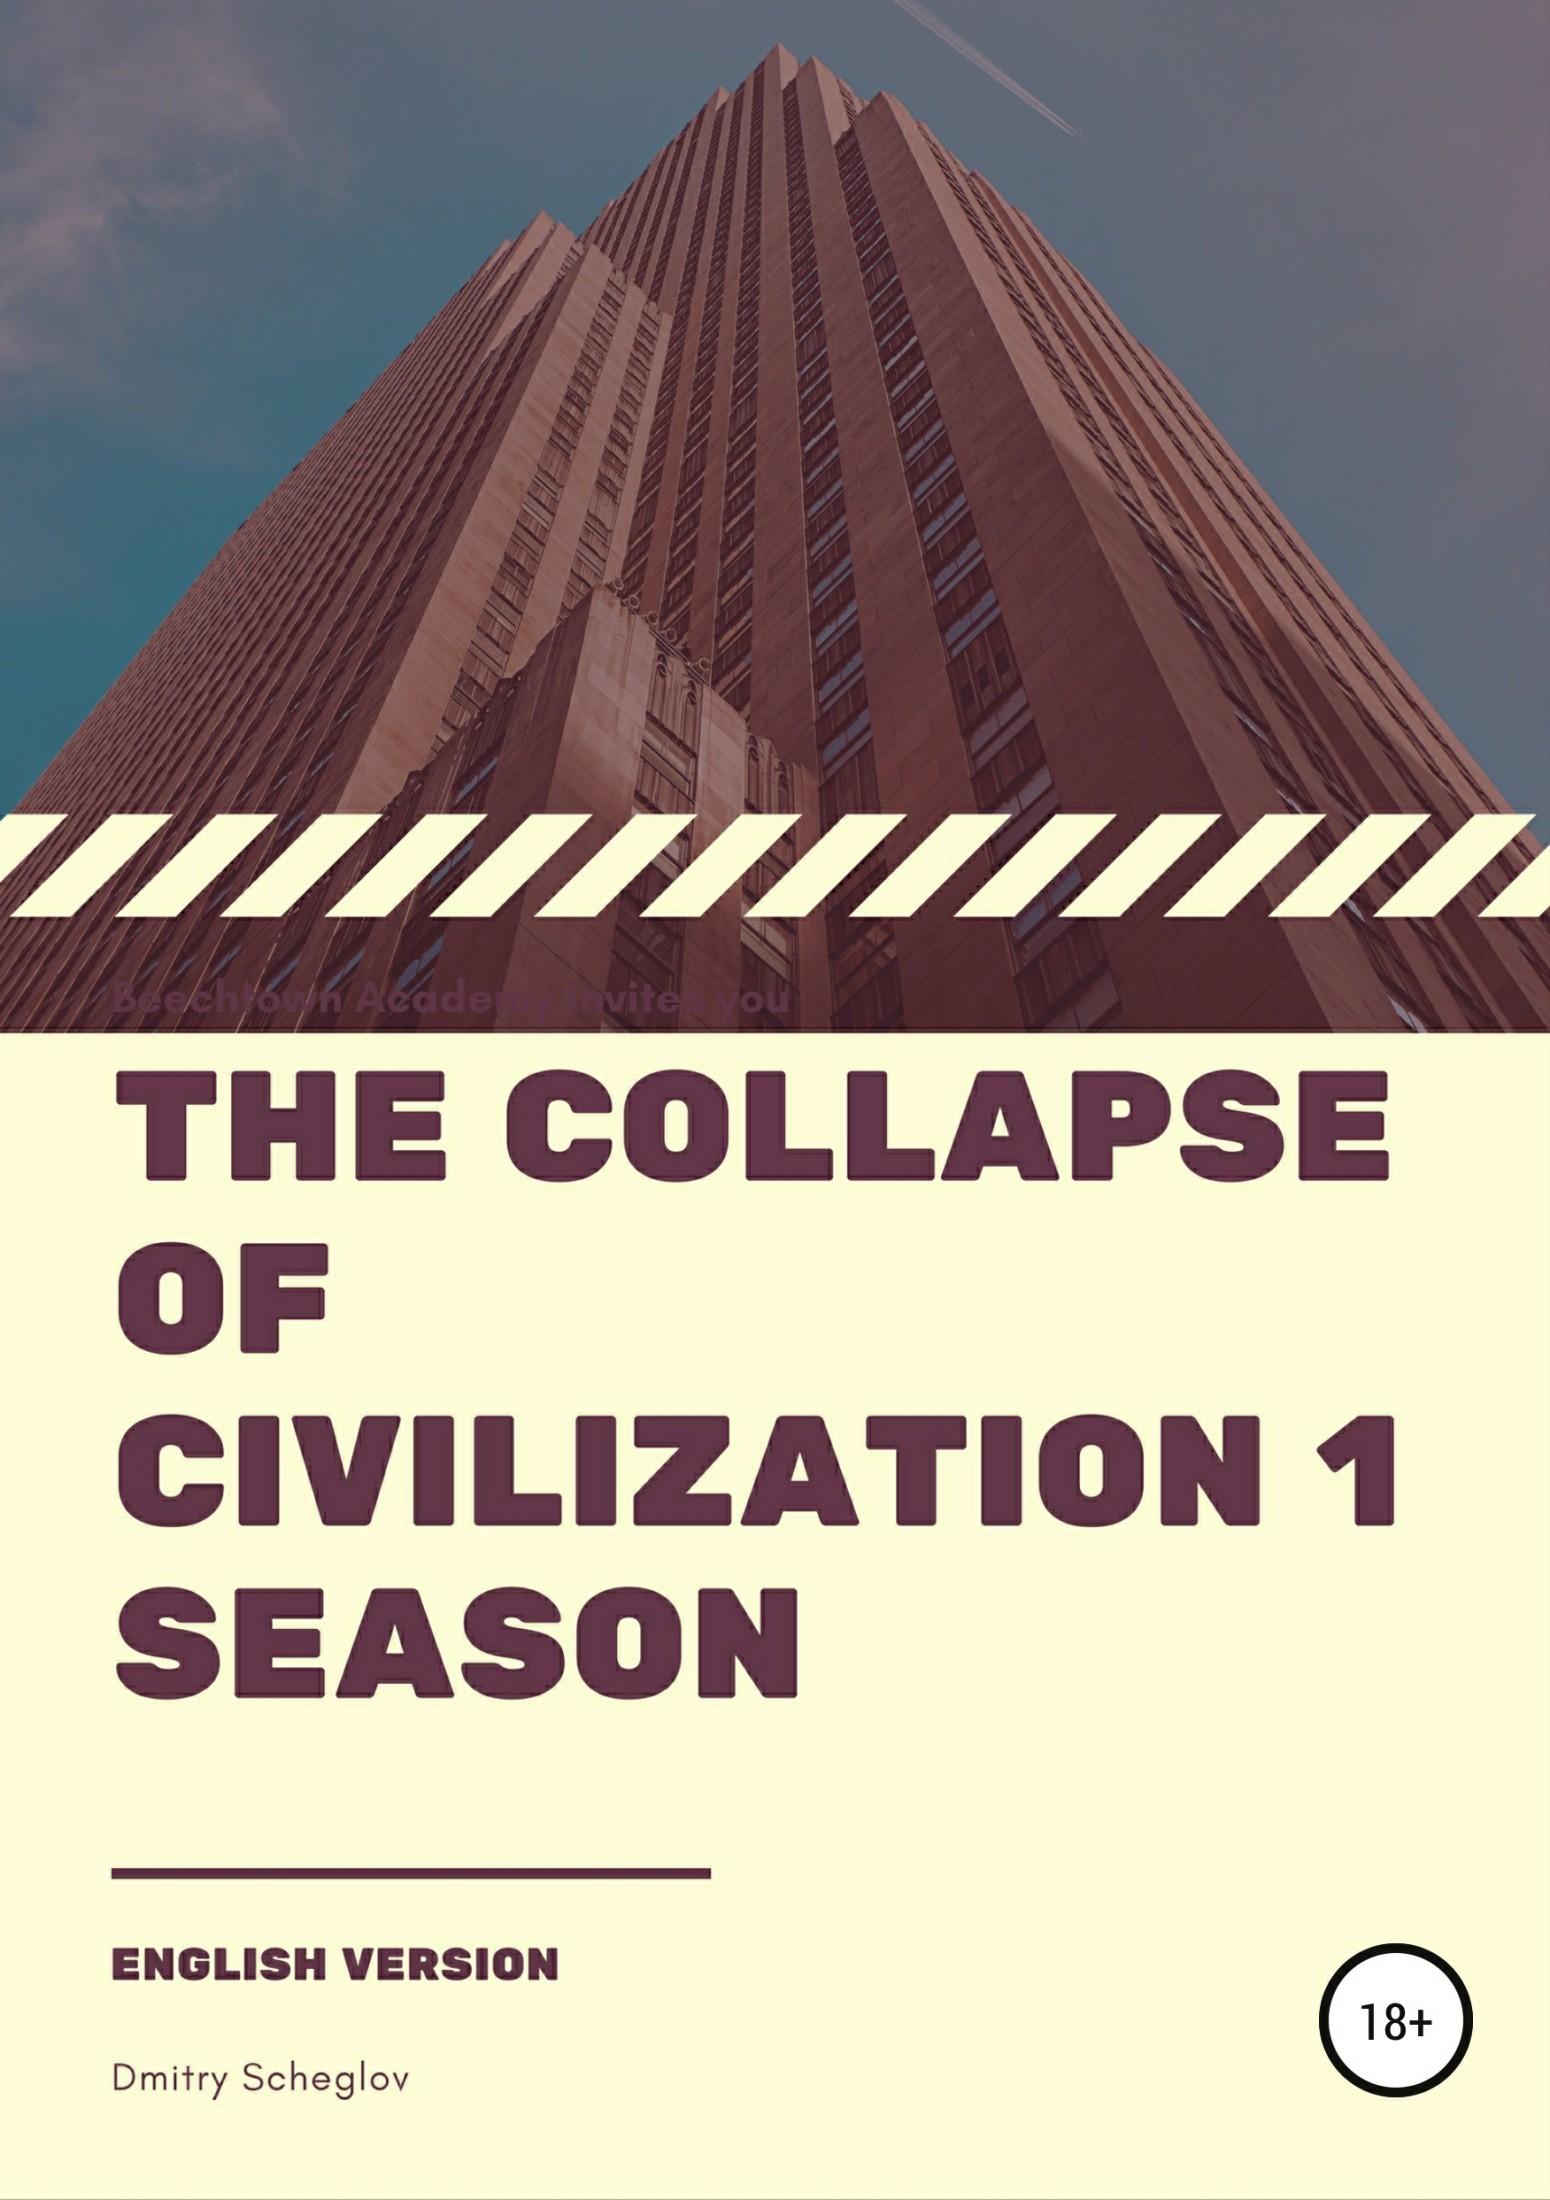 Дмитрий Щеглов - The collapse of civilization. 1season